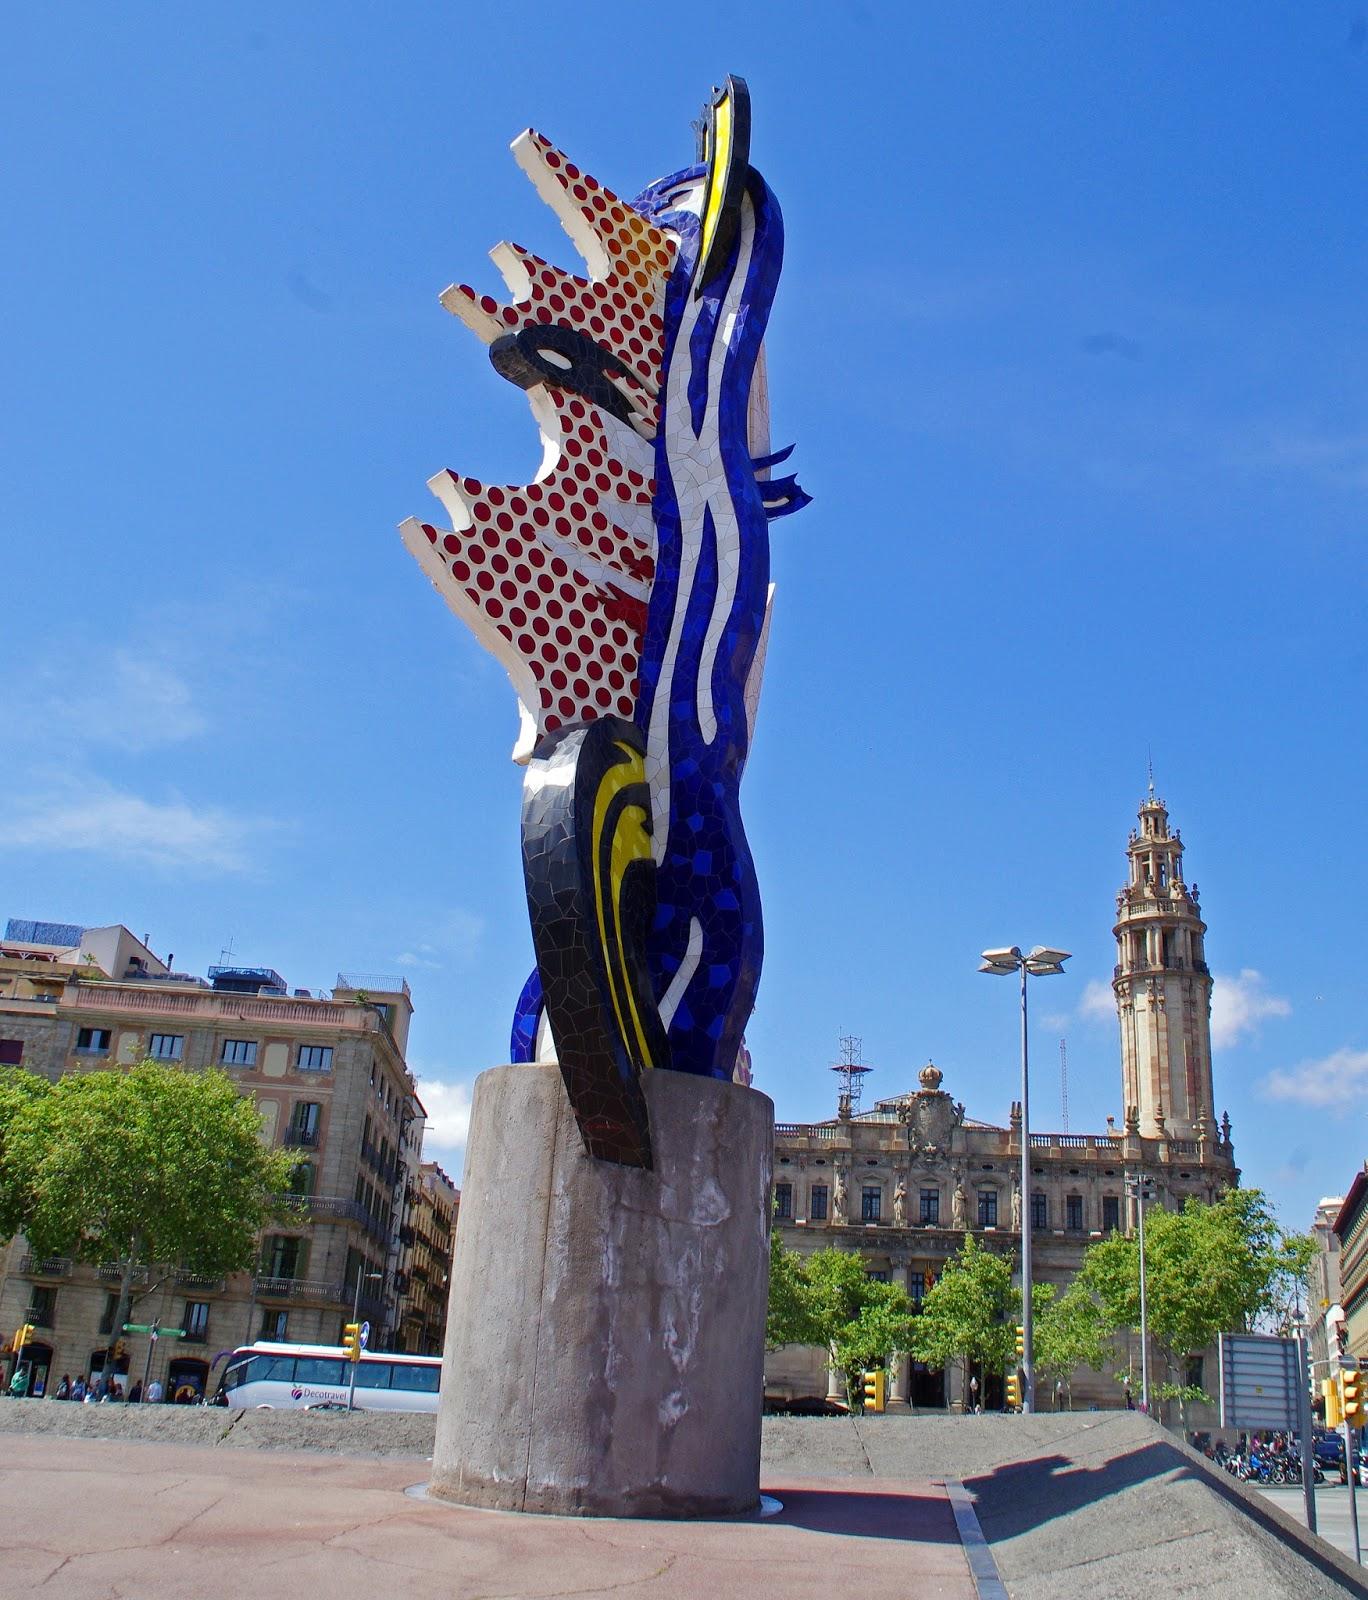 Mosaic statue in Barcelona